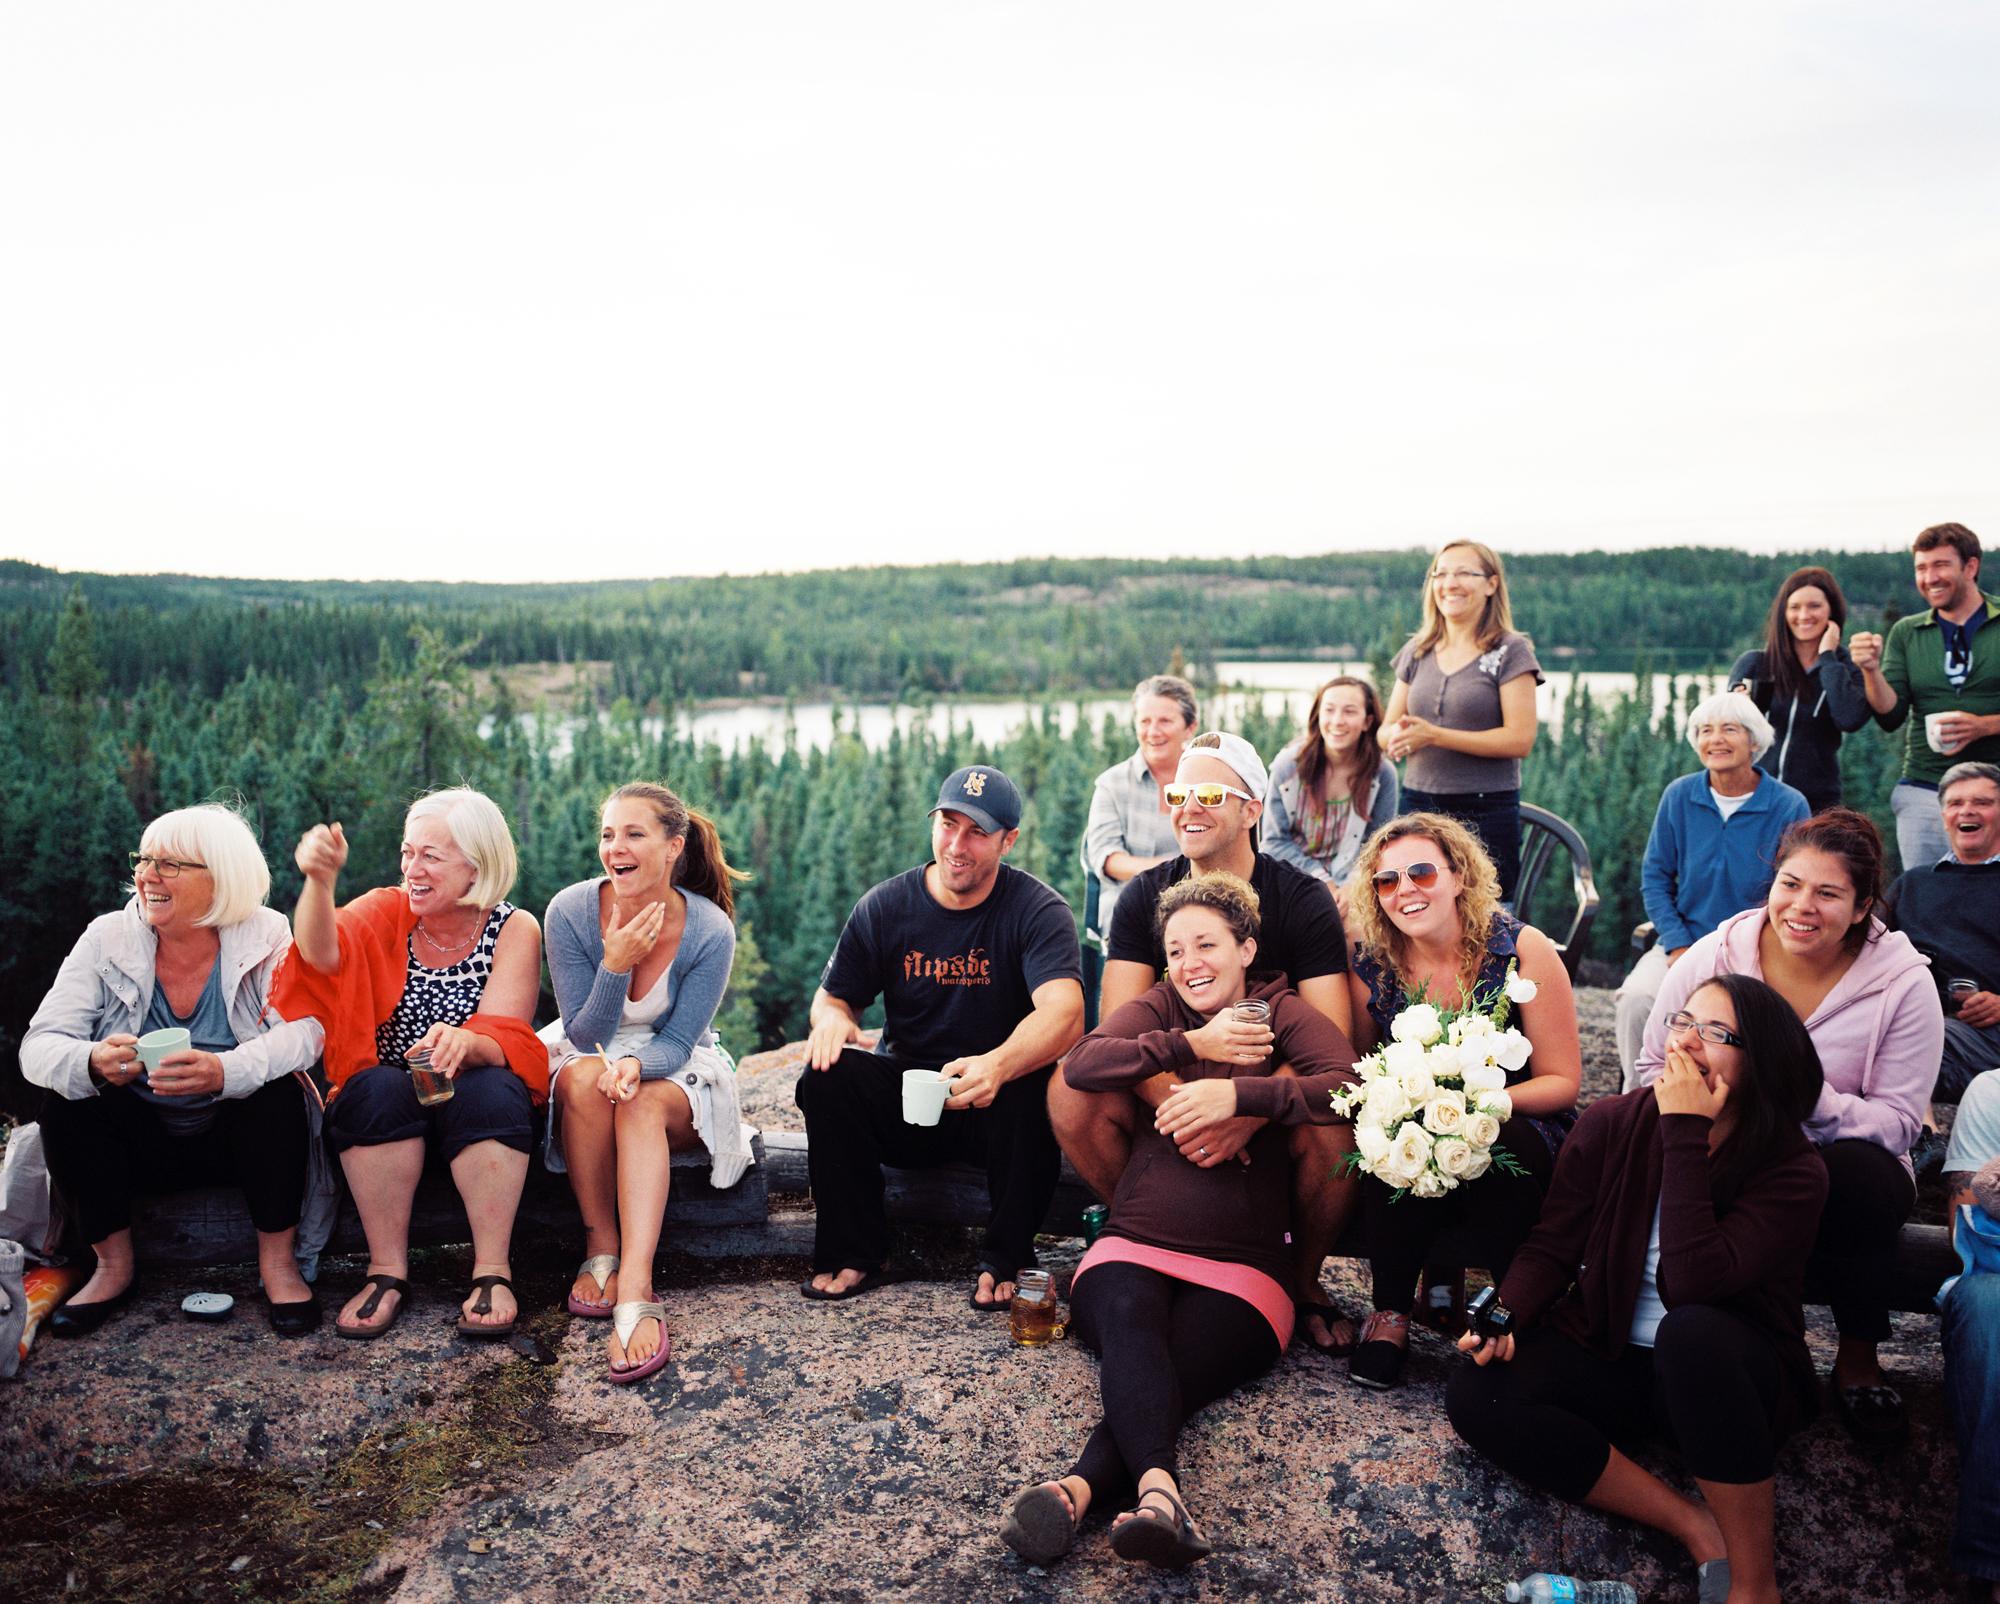 Post weeding day gathering